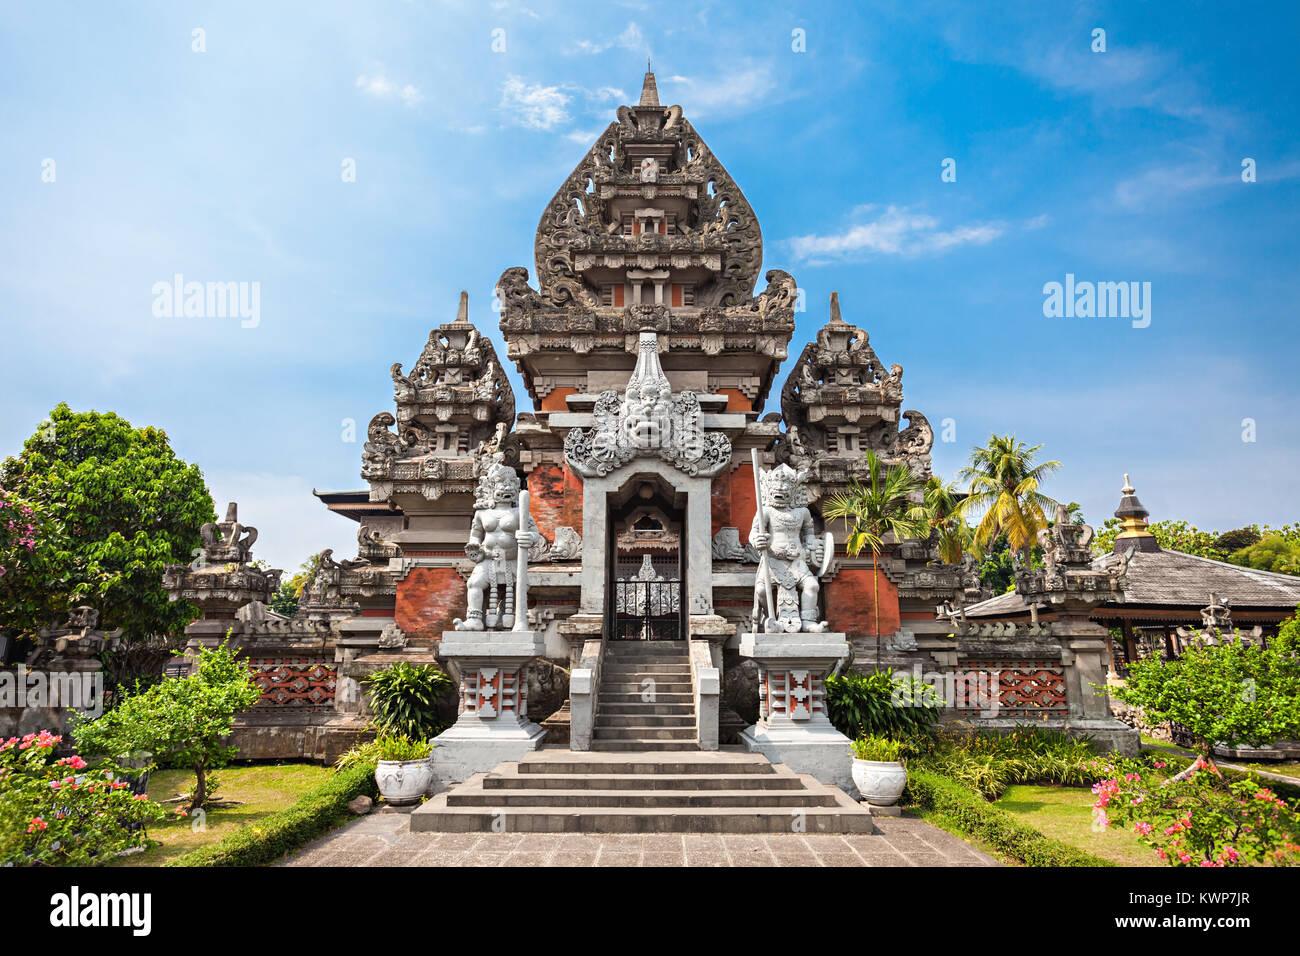 The Balinese style Indonesia Museum, Jakarta - Stock Image